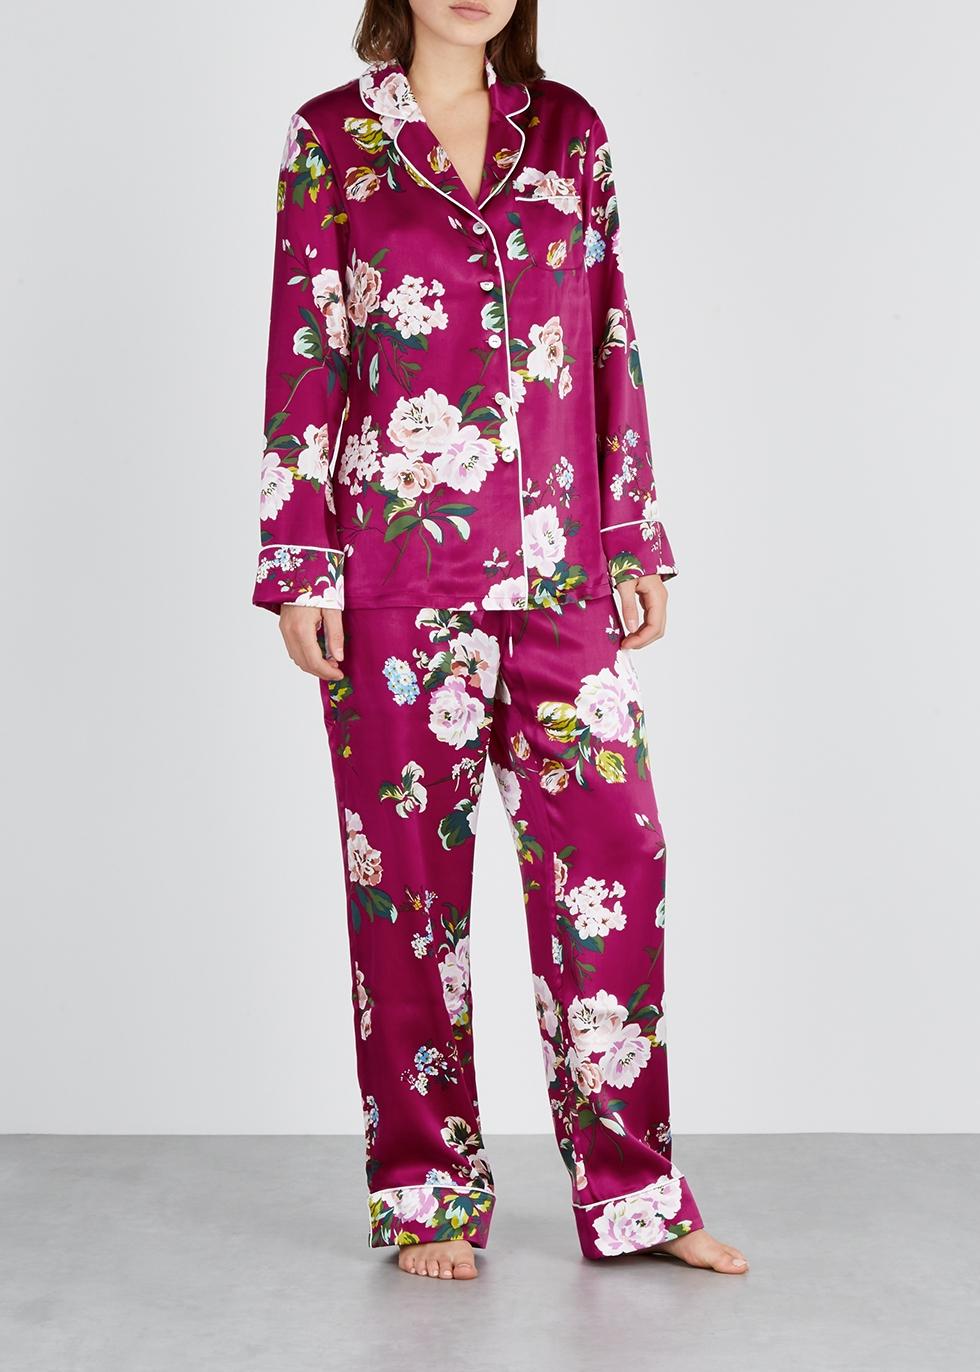 47f60b1b22 Designer Sleepwear - Luxury Lingerie - Harvey Nichols